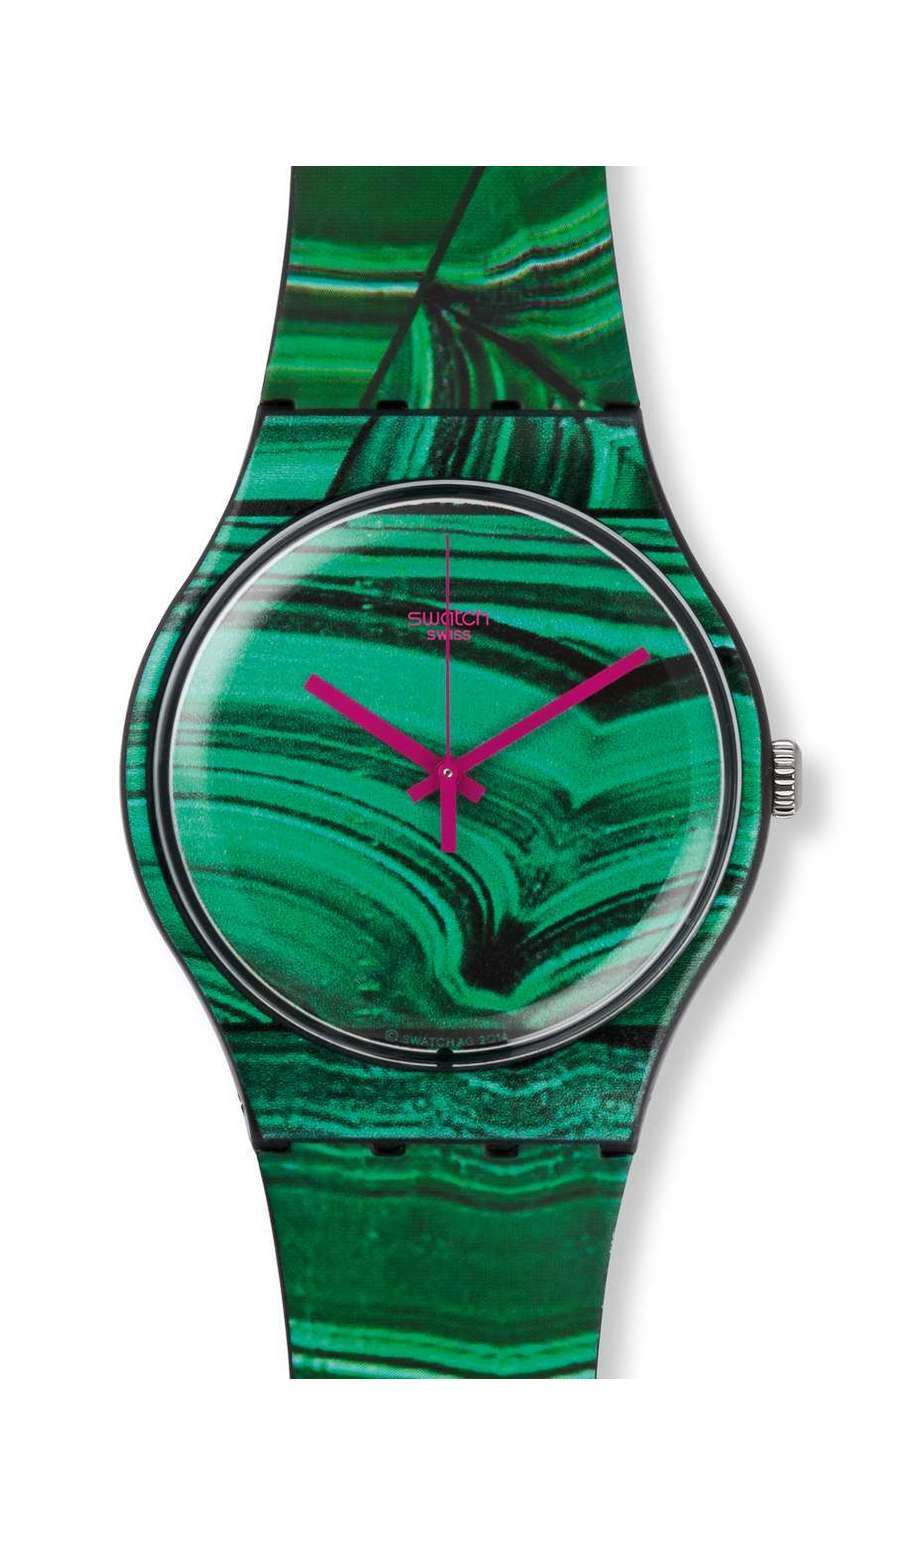 Swatch - MARMORA VERDE - 1